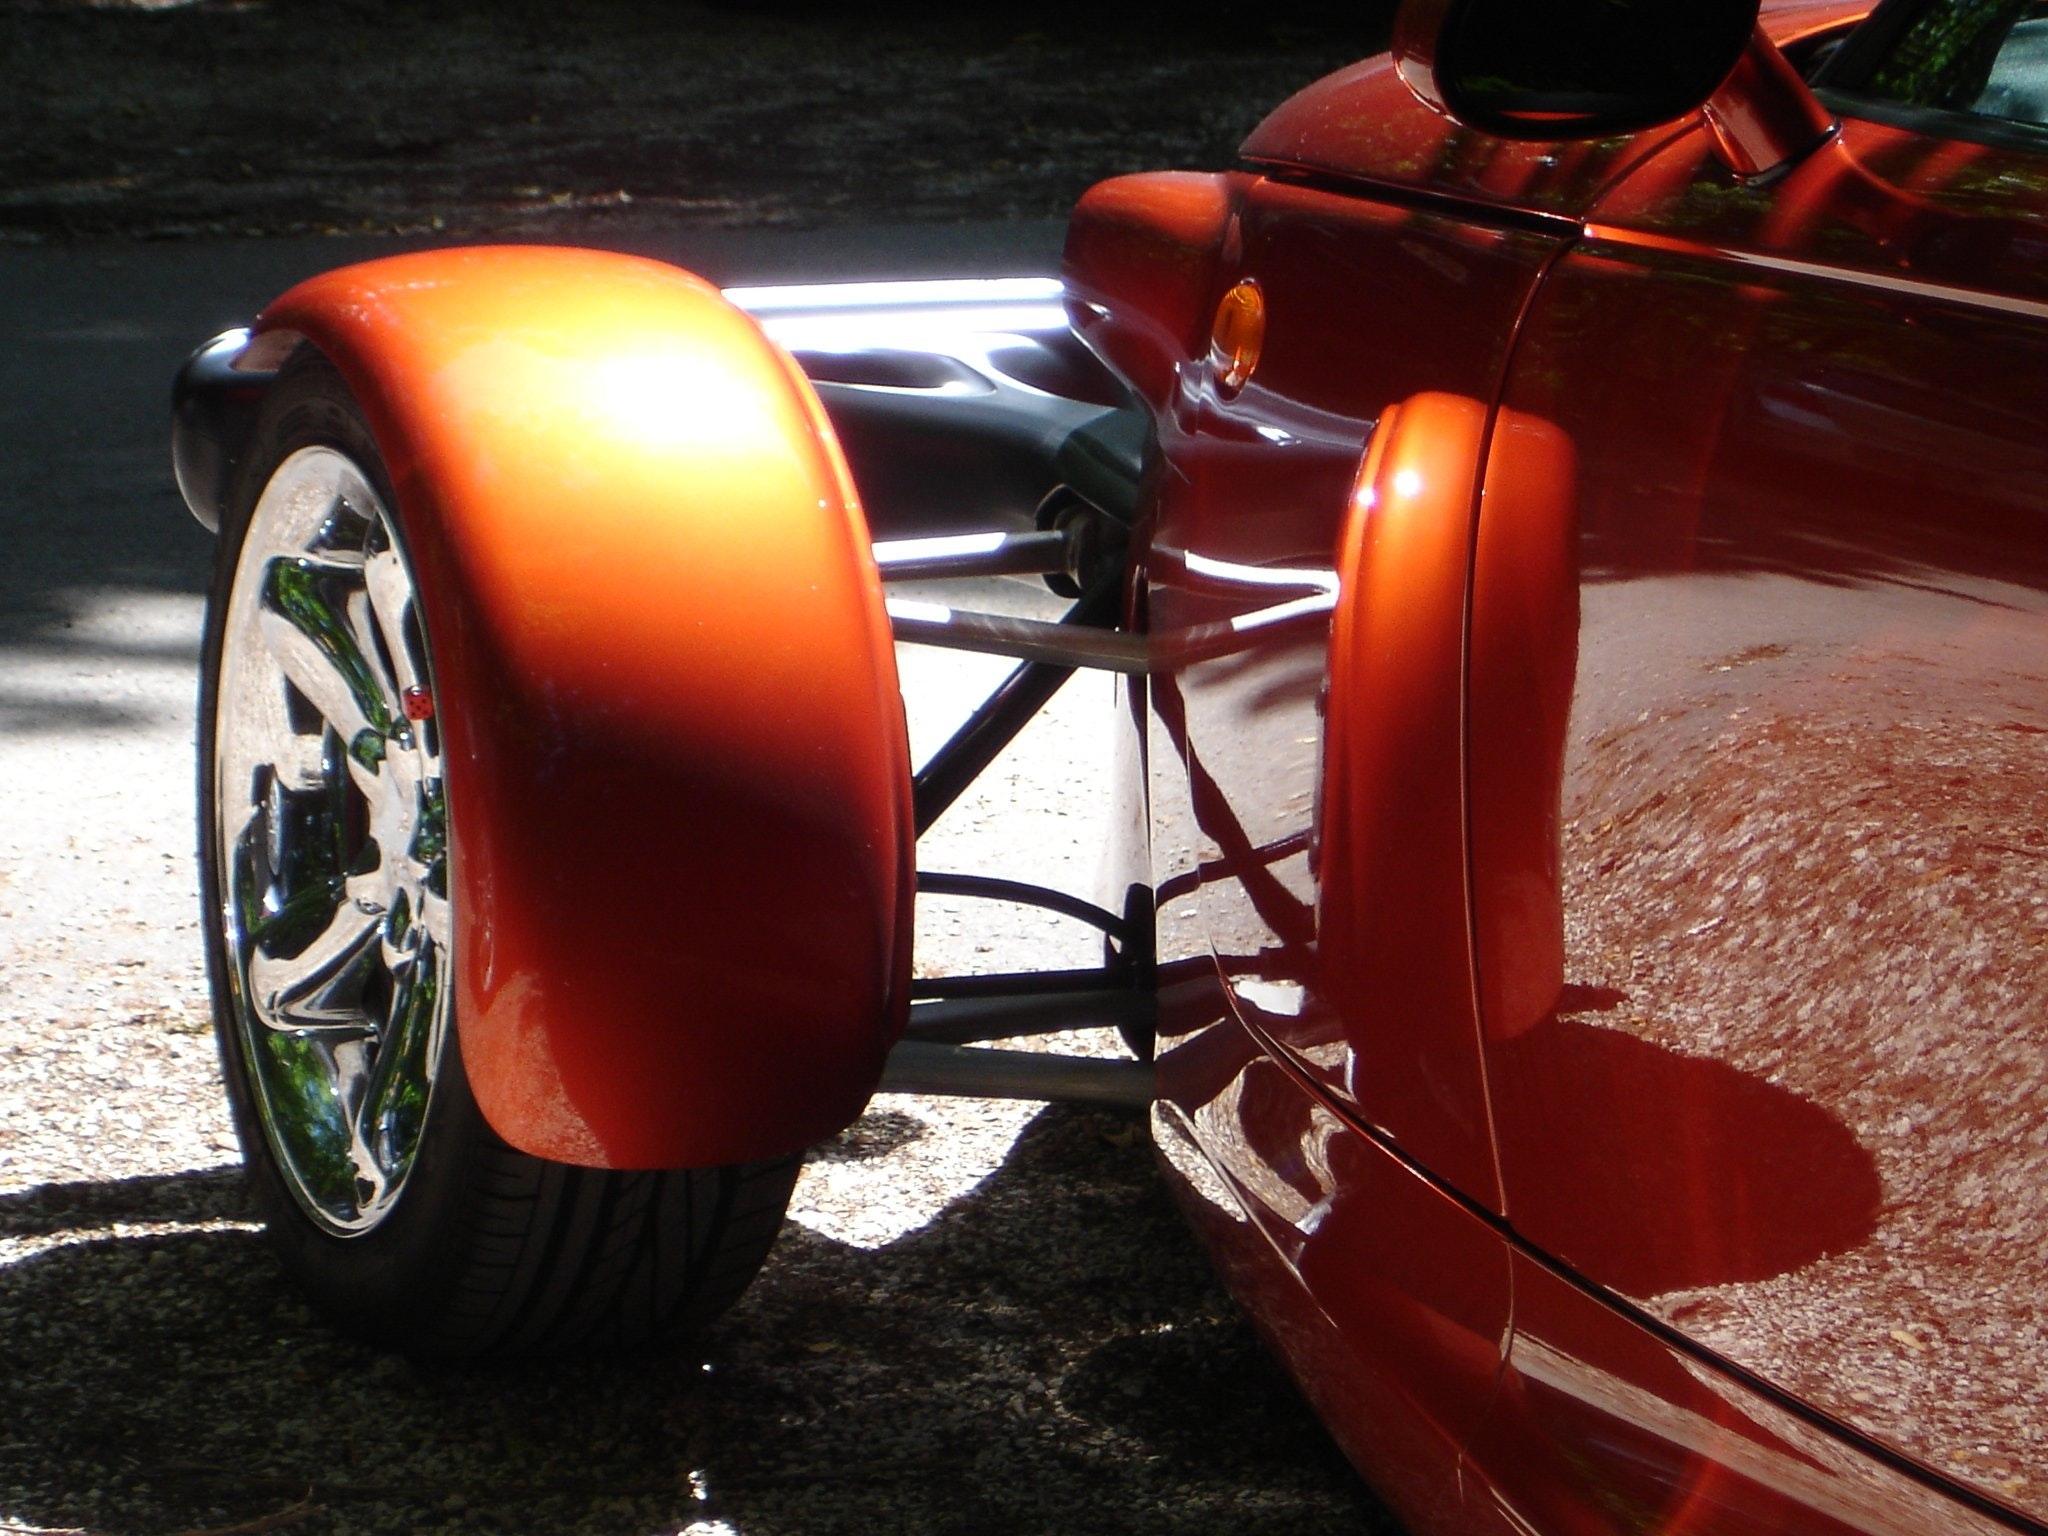 Orange Classic Car, Auto, Reflection, Vintage, Vehicle, HQ Photo